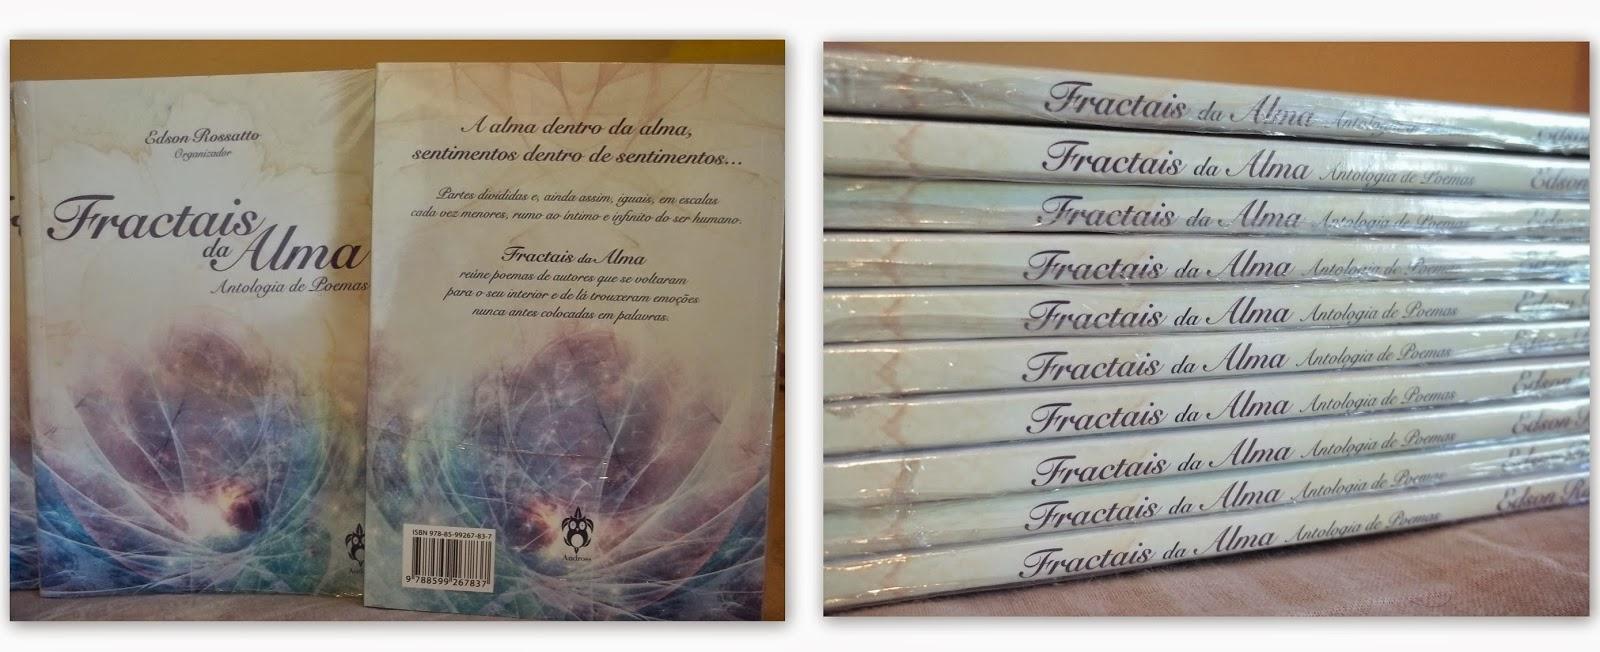 poesia, poemas, antologia, Editora Andross, Vanessa Vieira